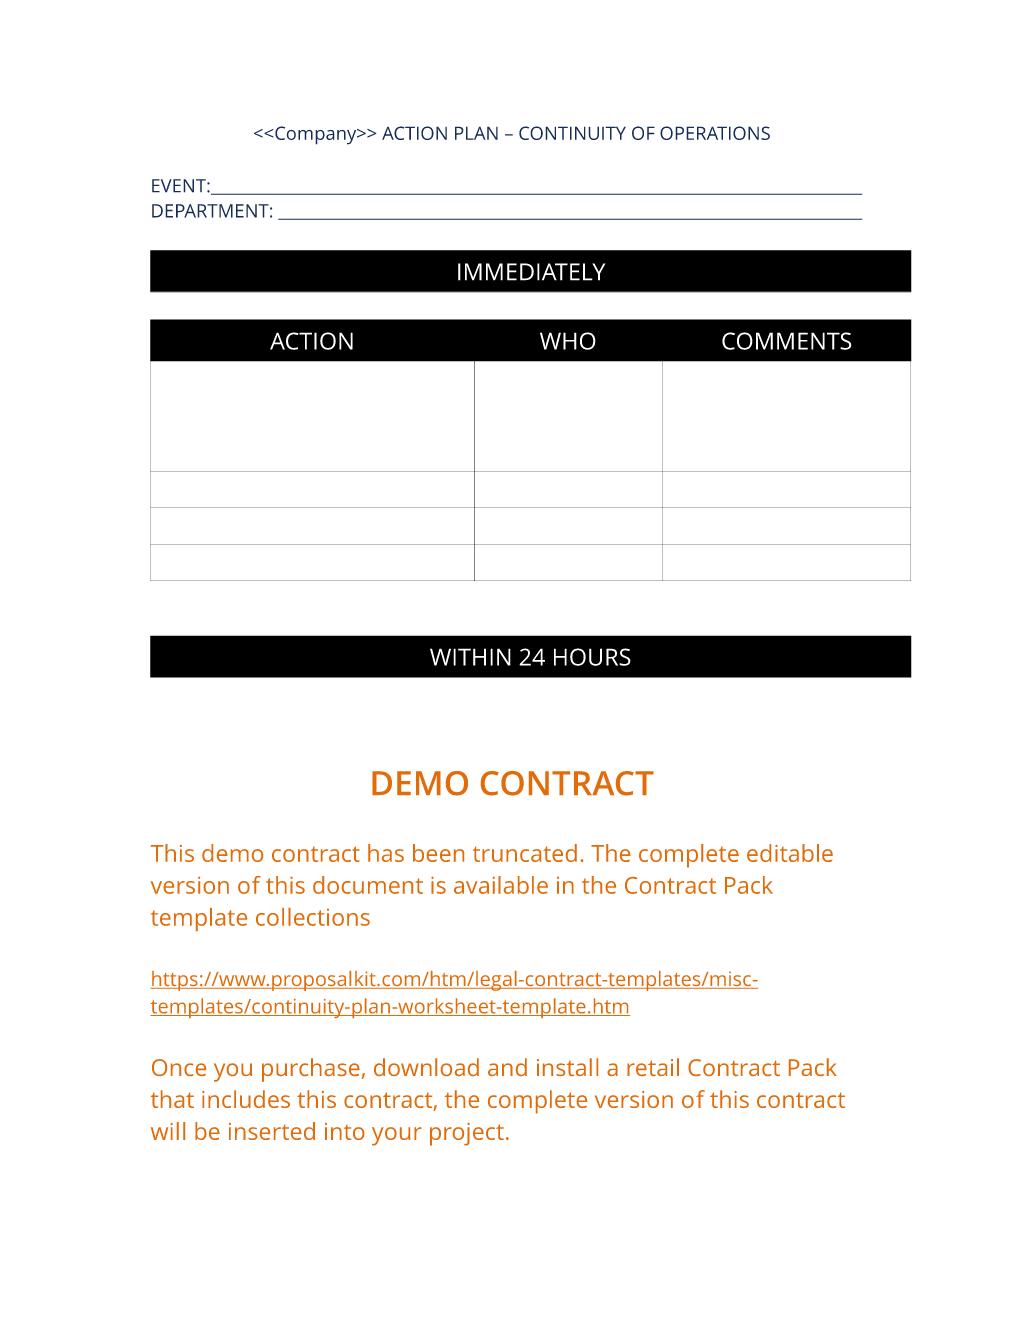 Continuity Plan Worksheet